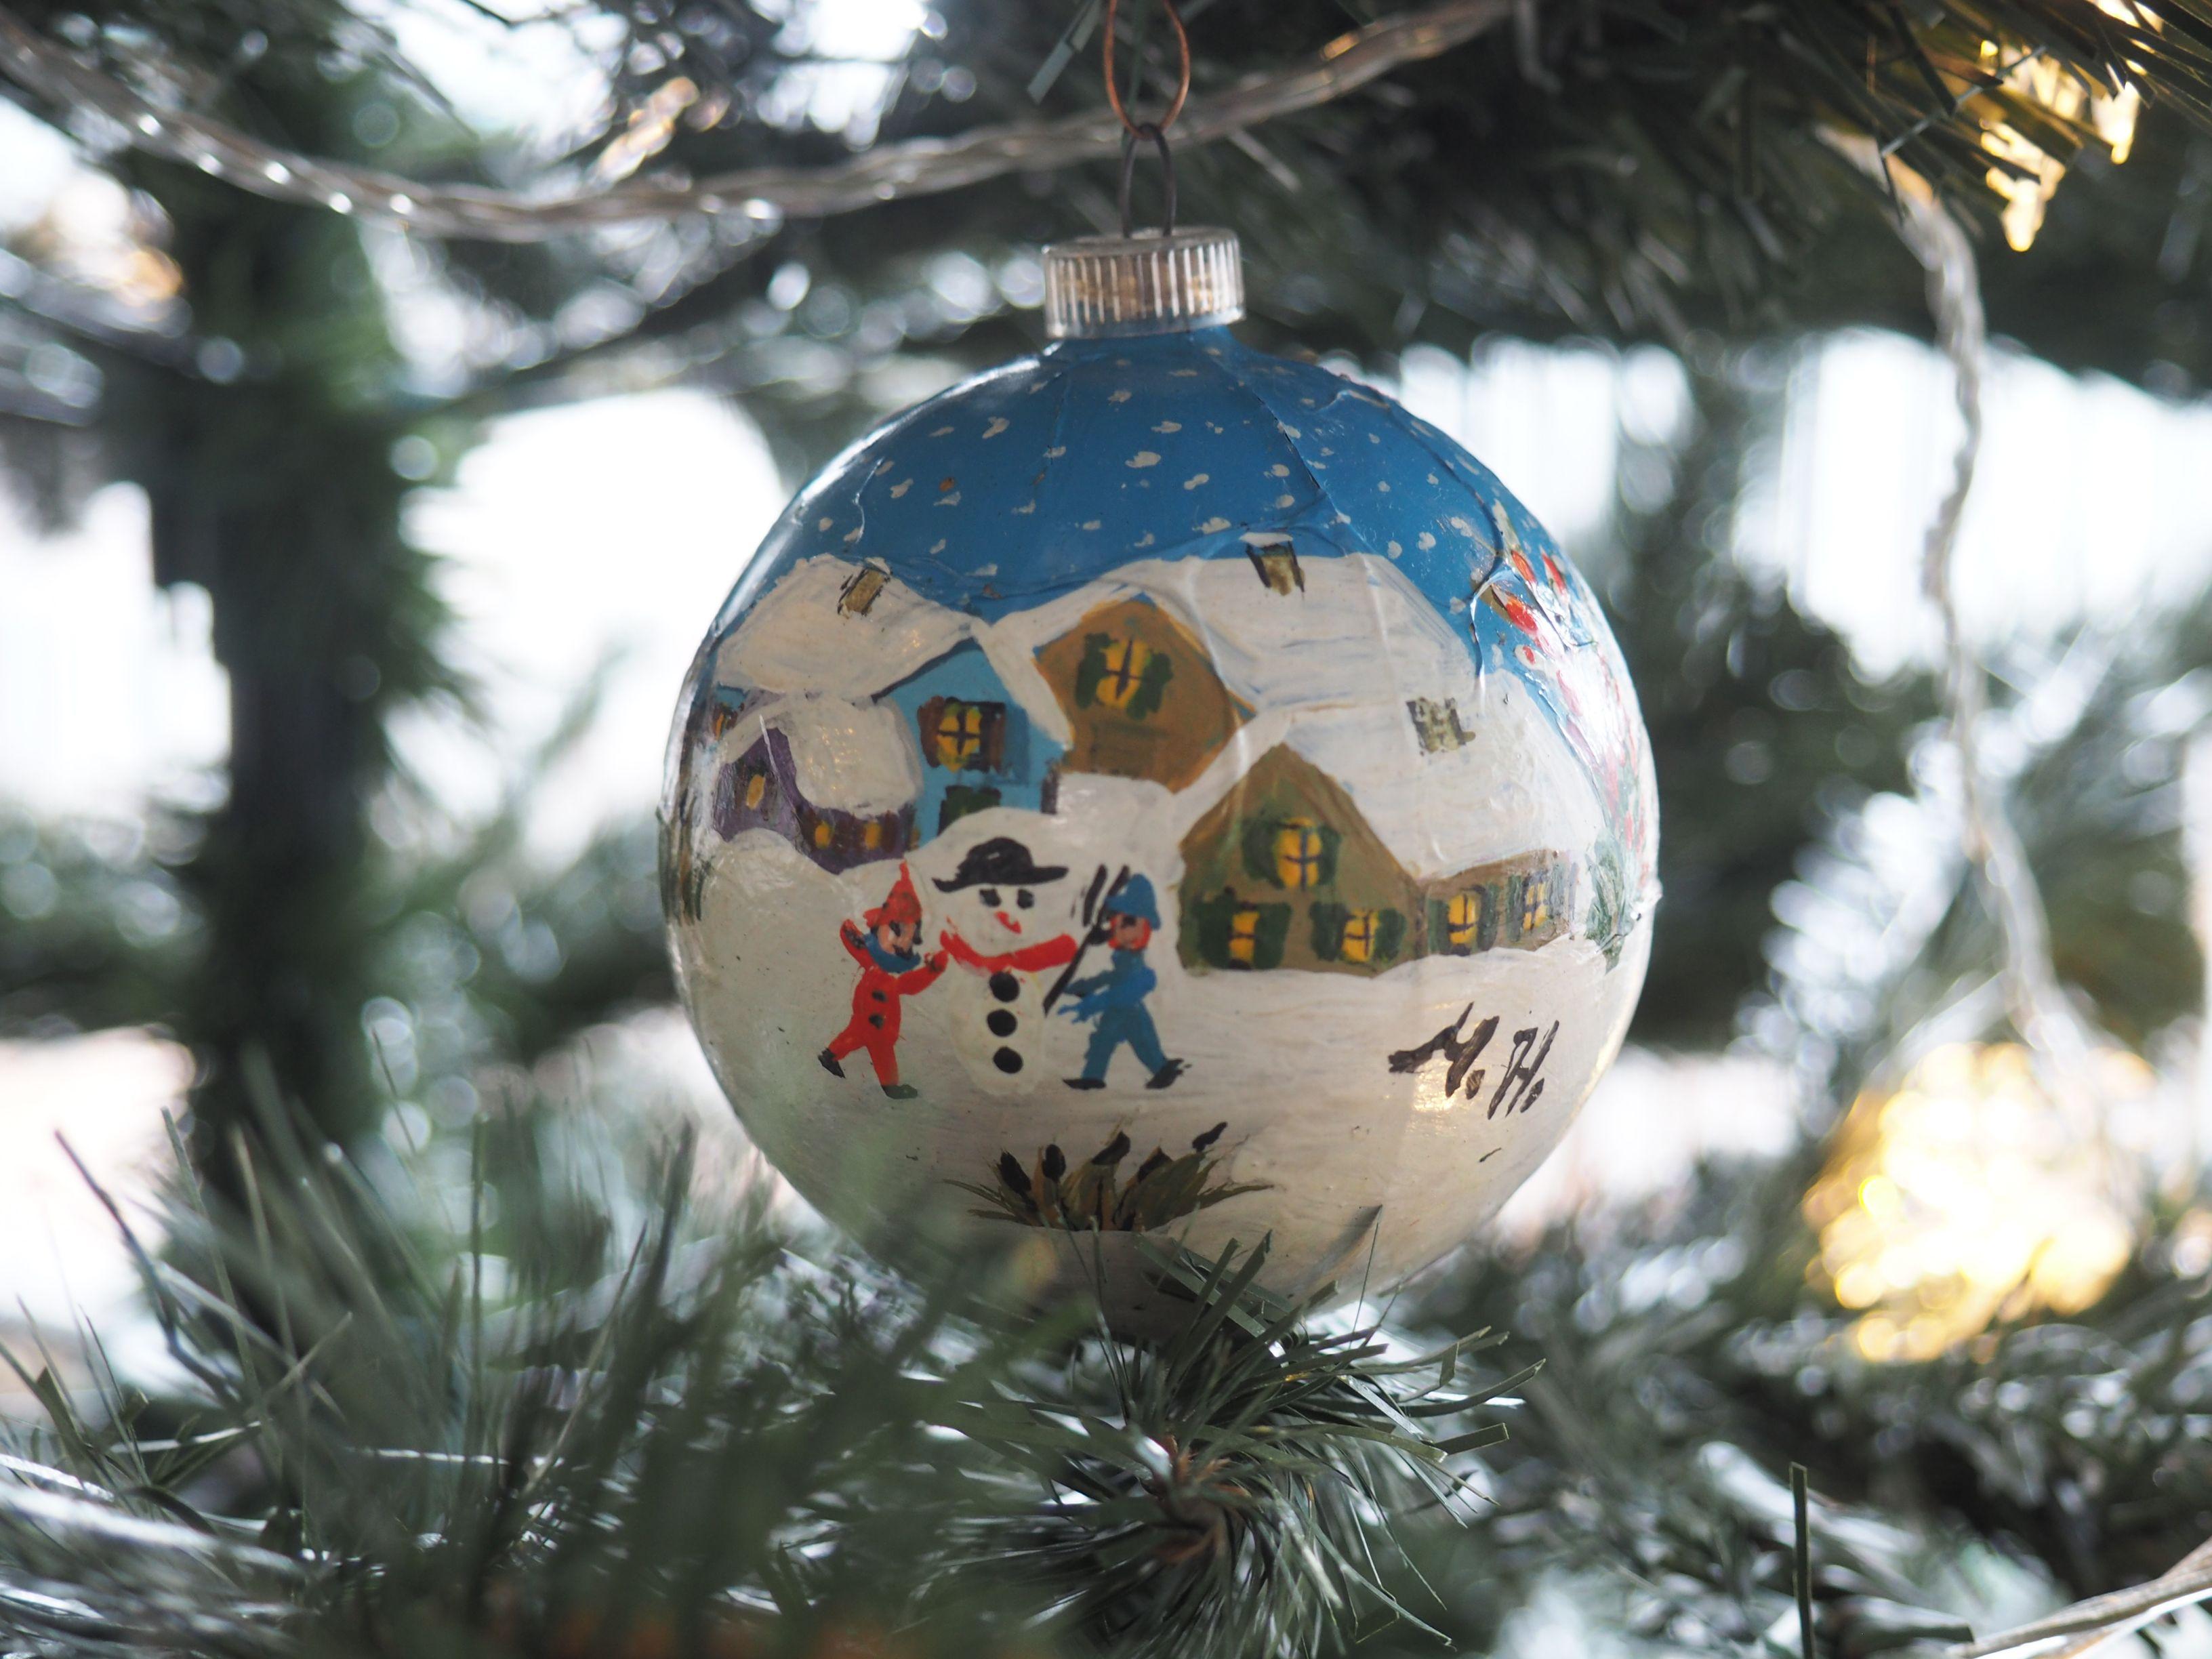 Handbemalte Christbaumkugeln.Handbemalte Christbaumkugeln Ihatemonday Christmas Bulbs